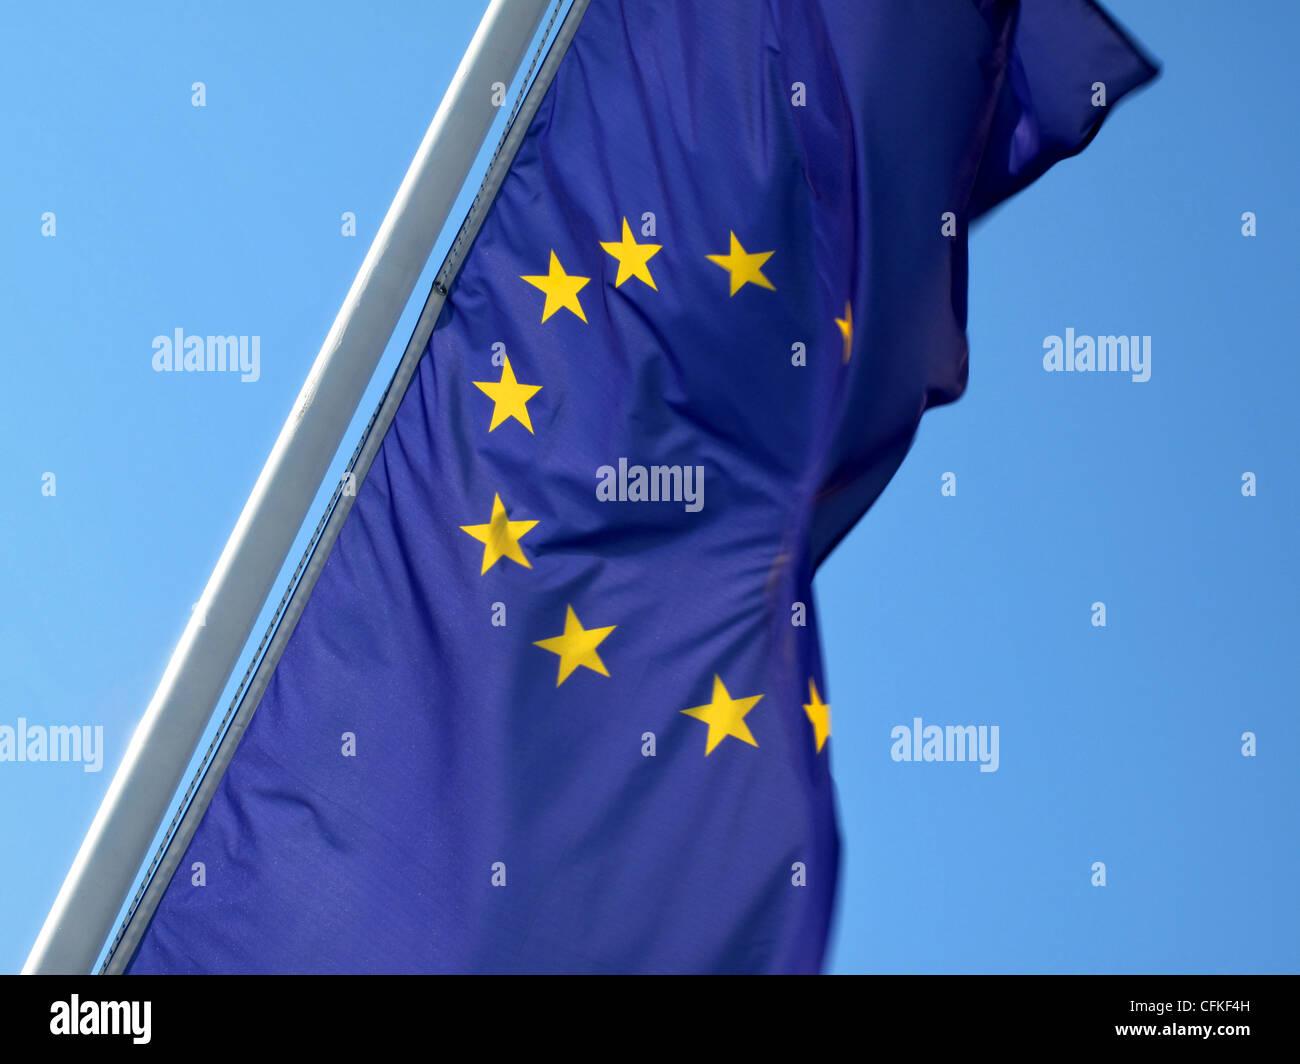 Flag of the European Union EEC - Stock Image